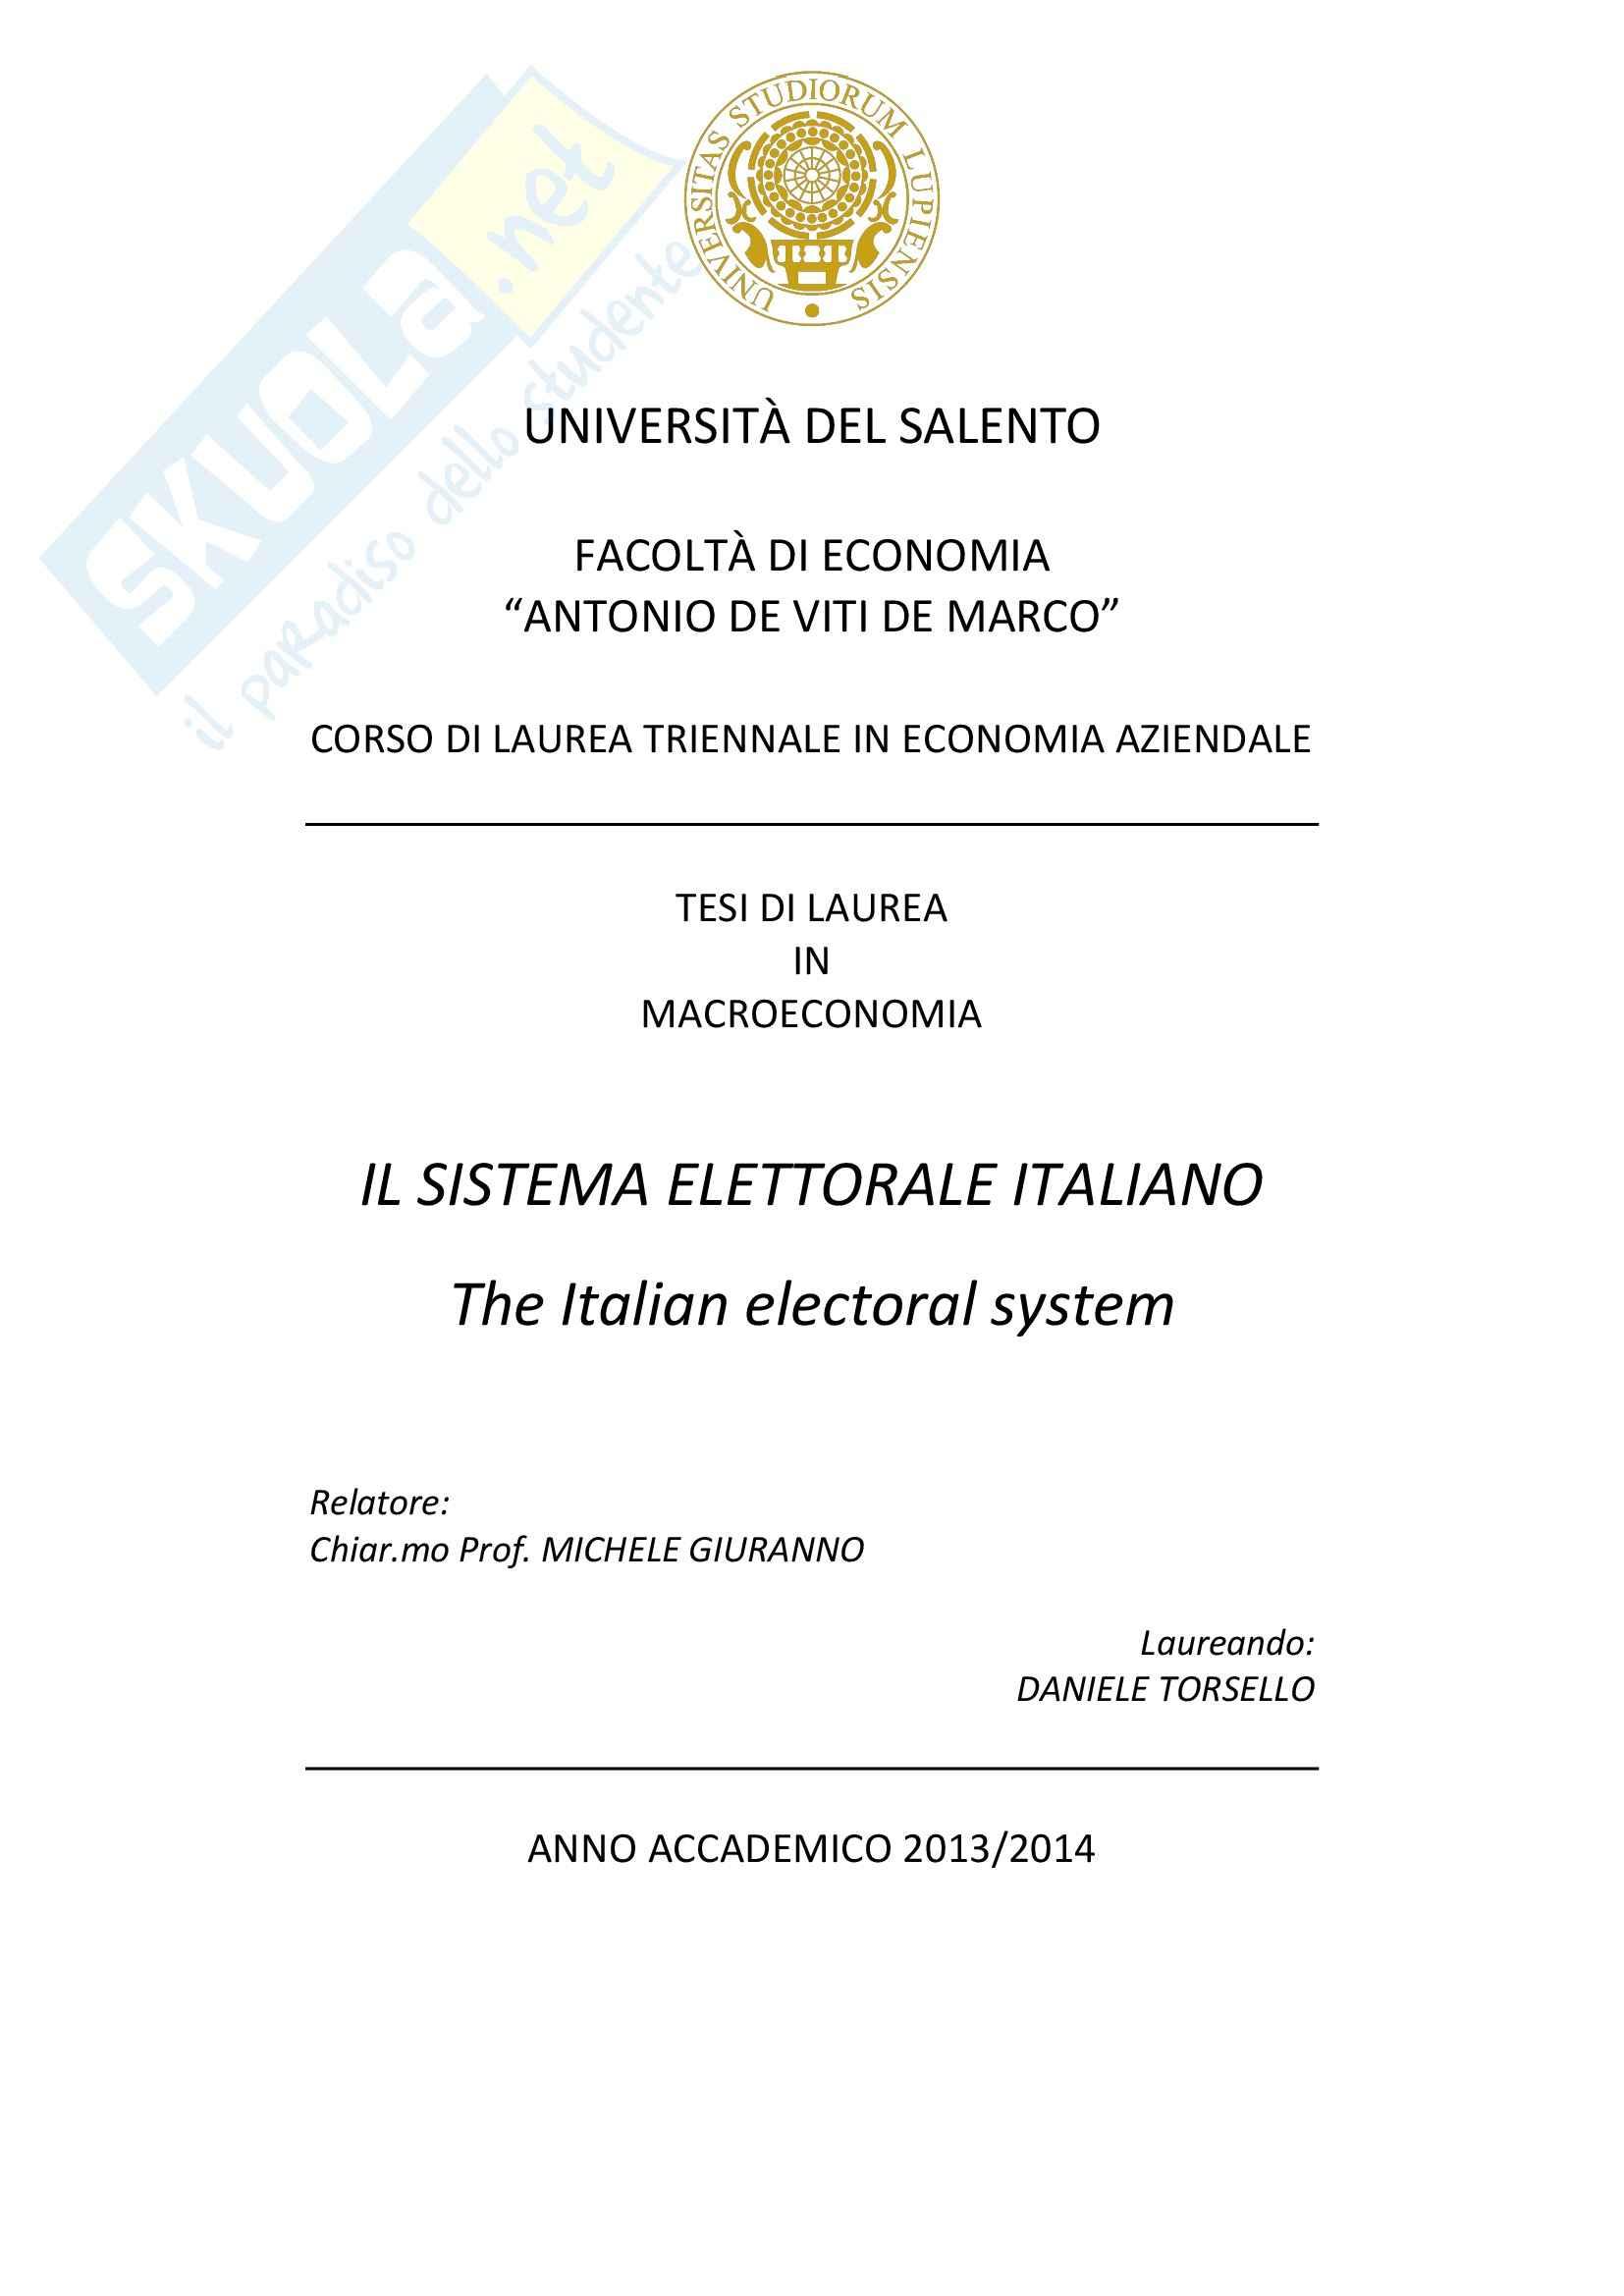 Sistema elettorale italiano